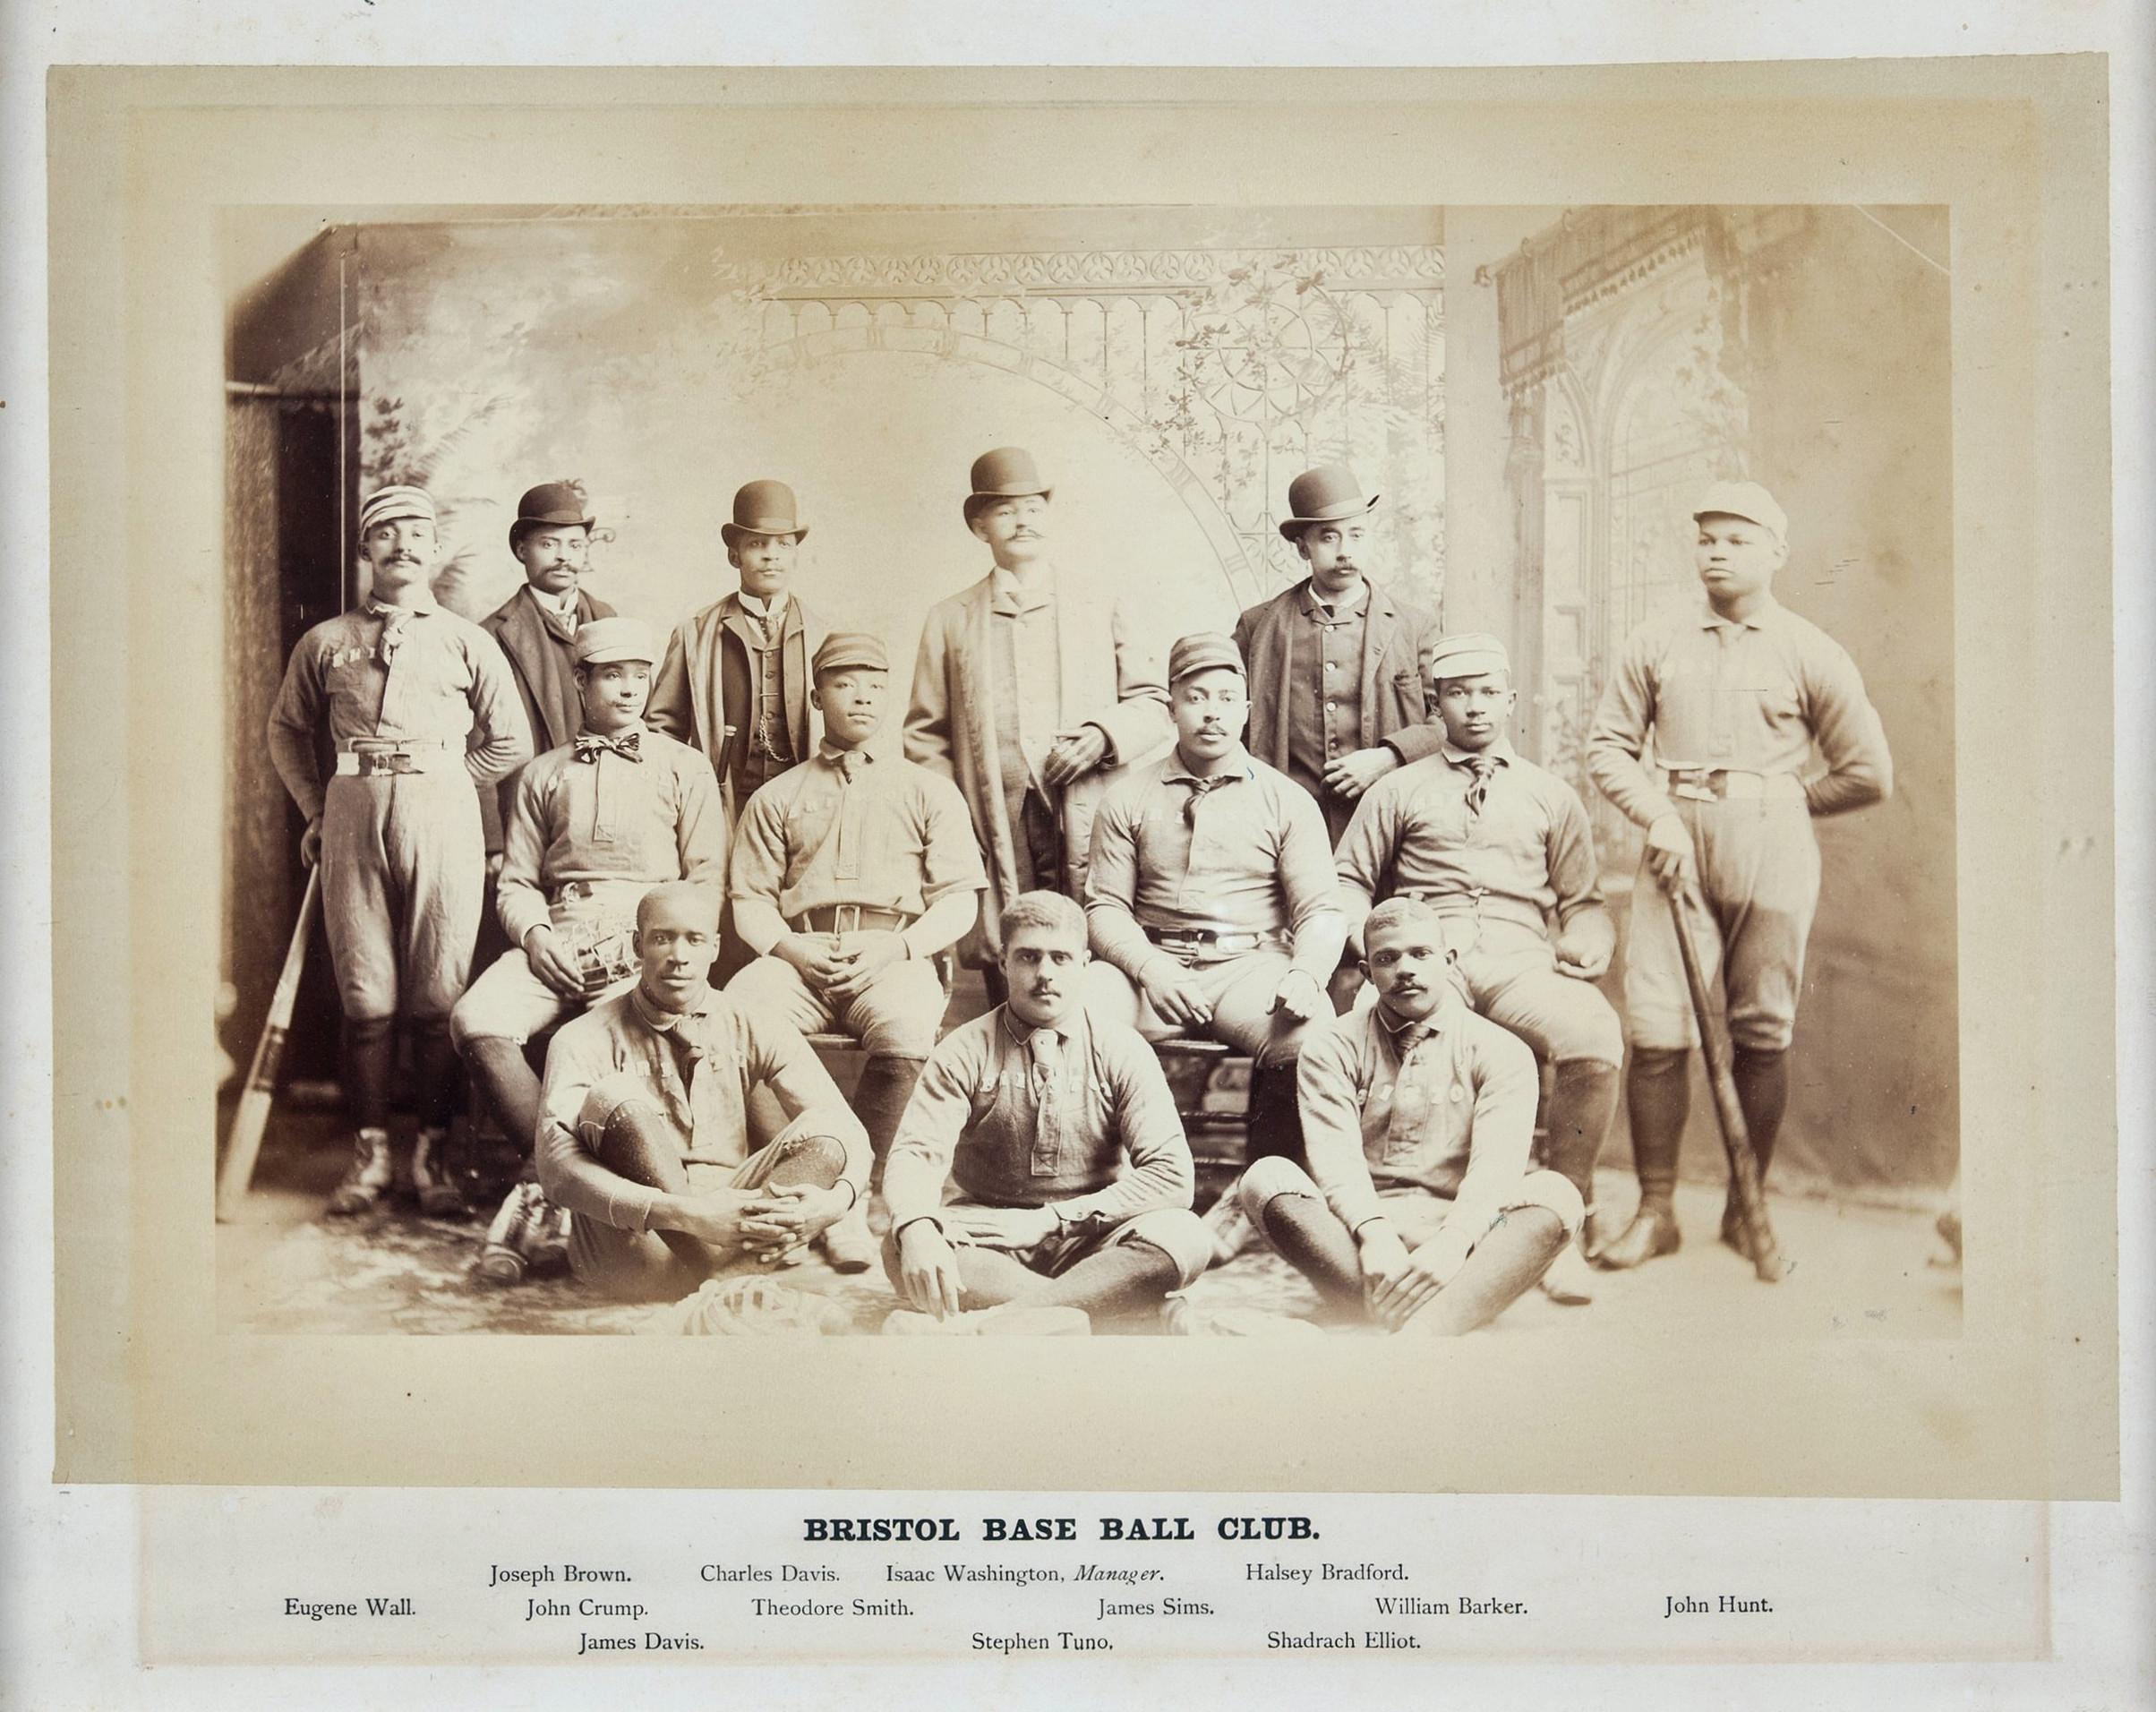 Bristol Base Ball Club, 1890